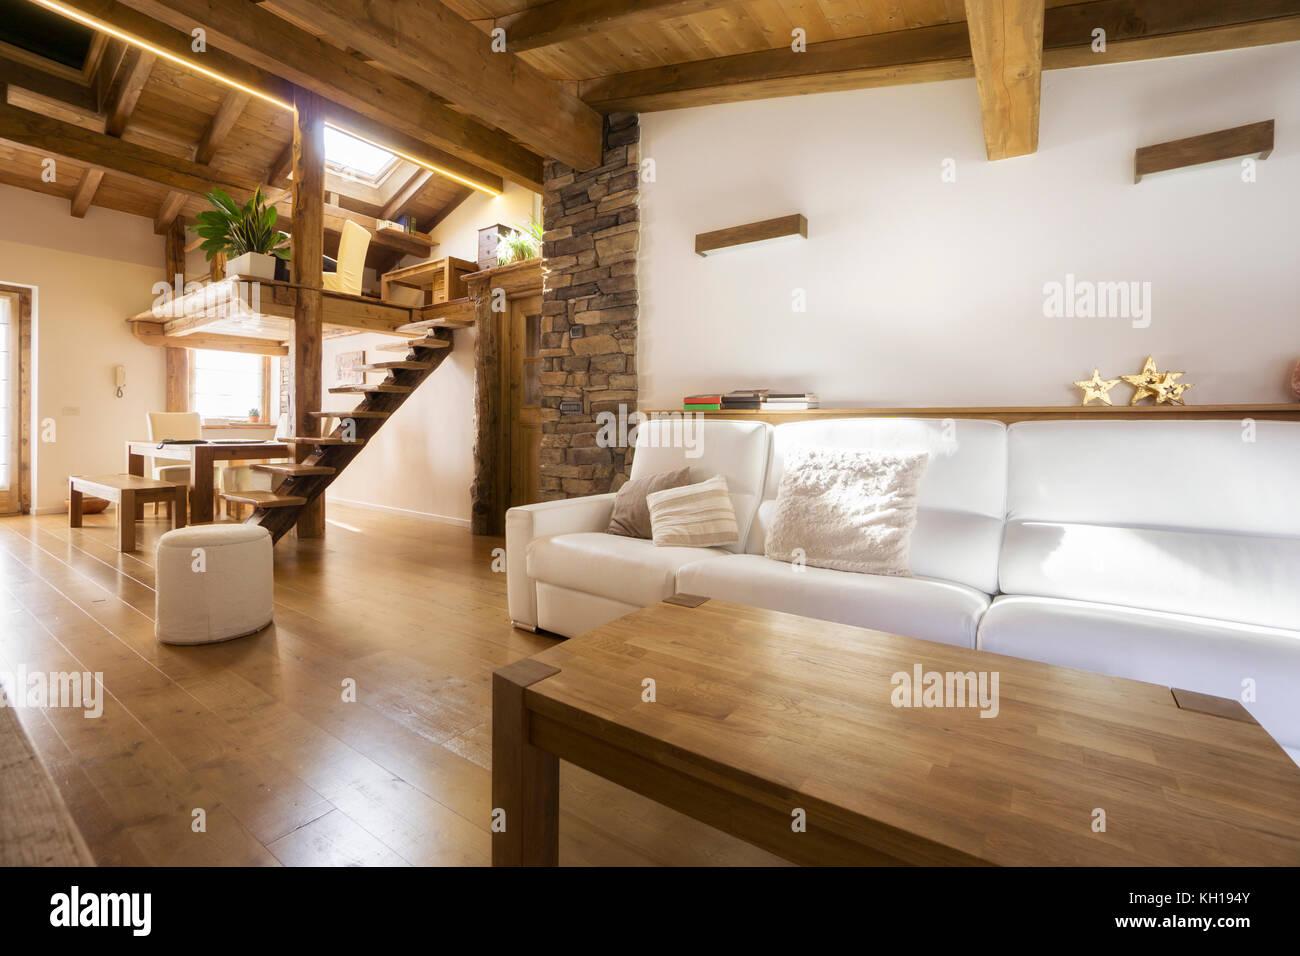 Chalet Stil moderne Wohnung in Holz Stockfoto, Bild: 165371611 - Alamy